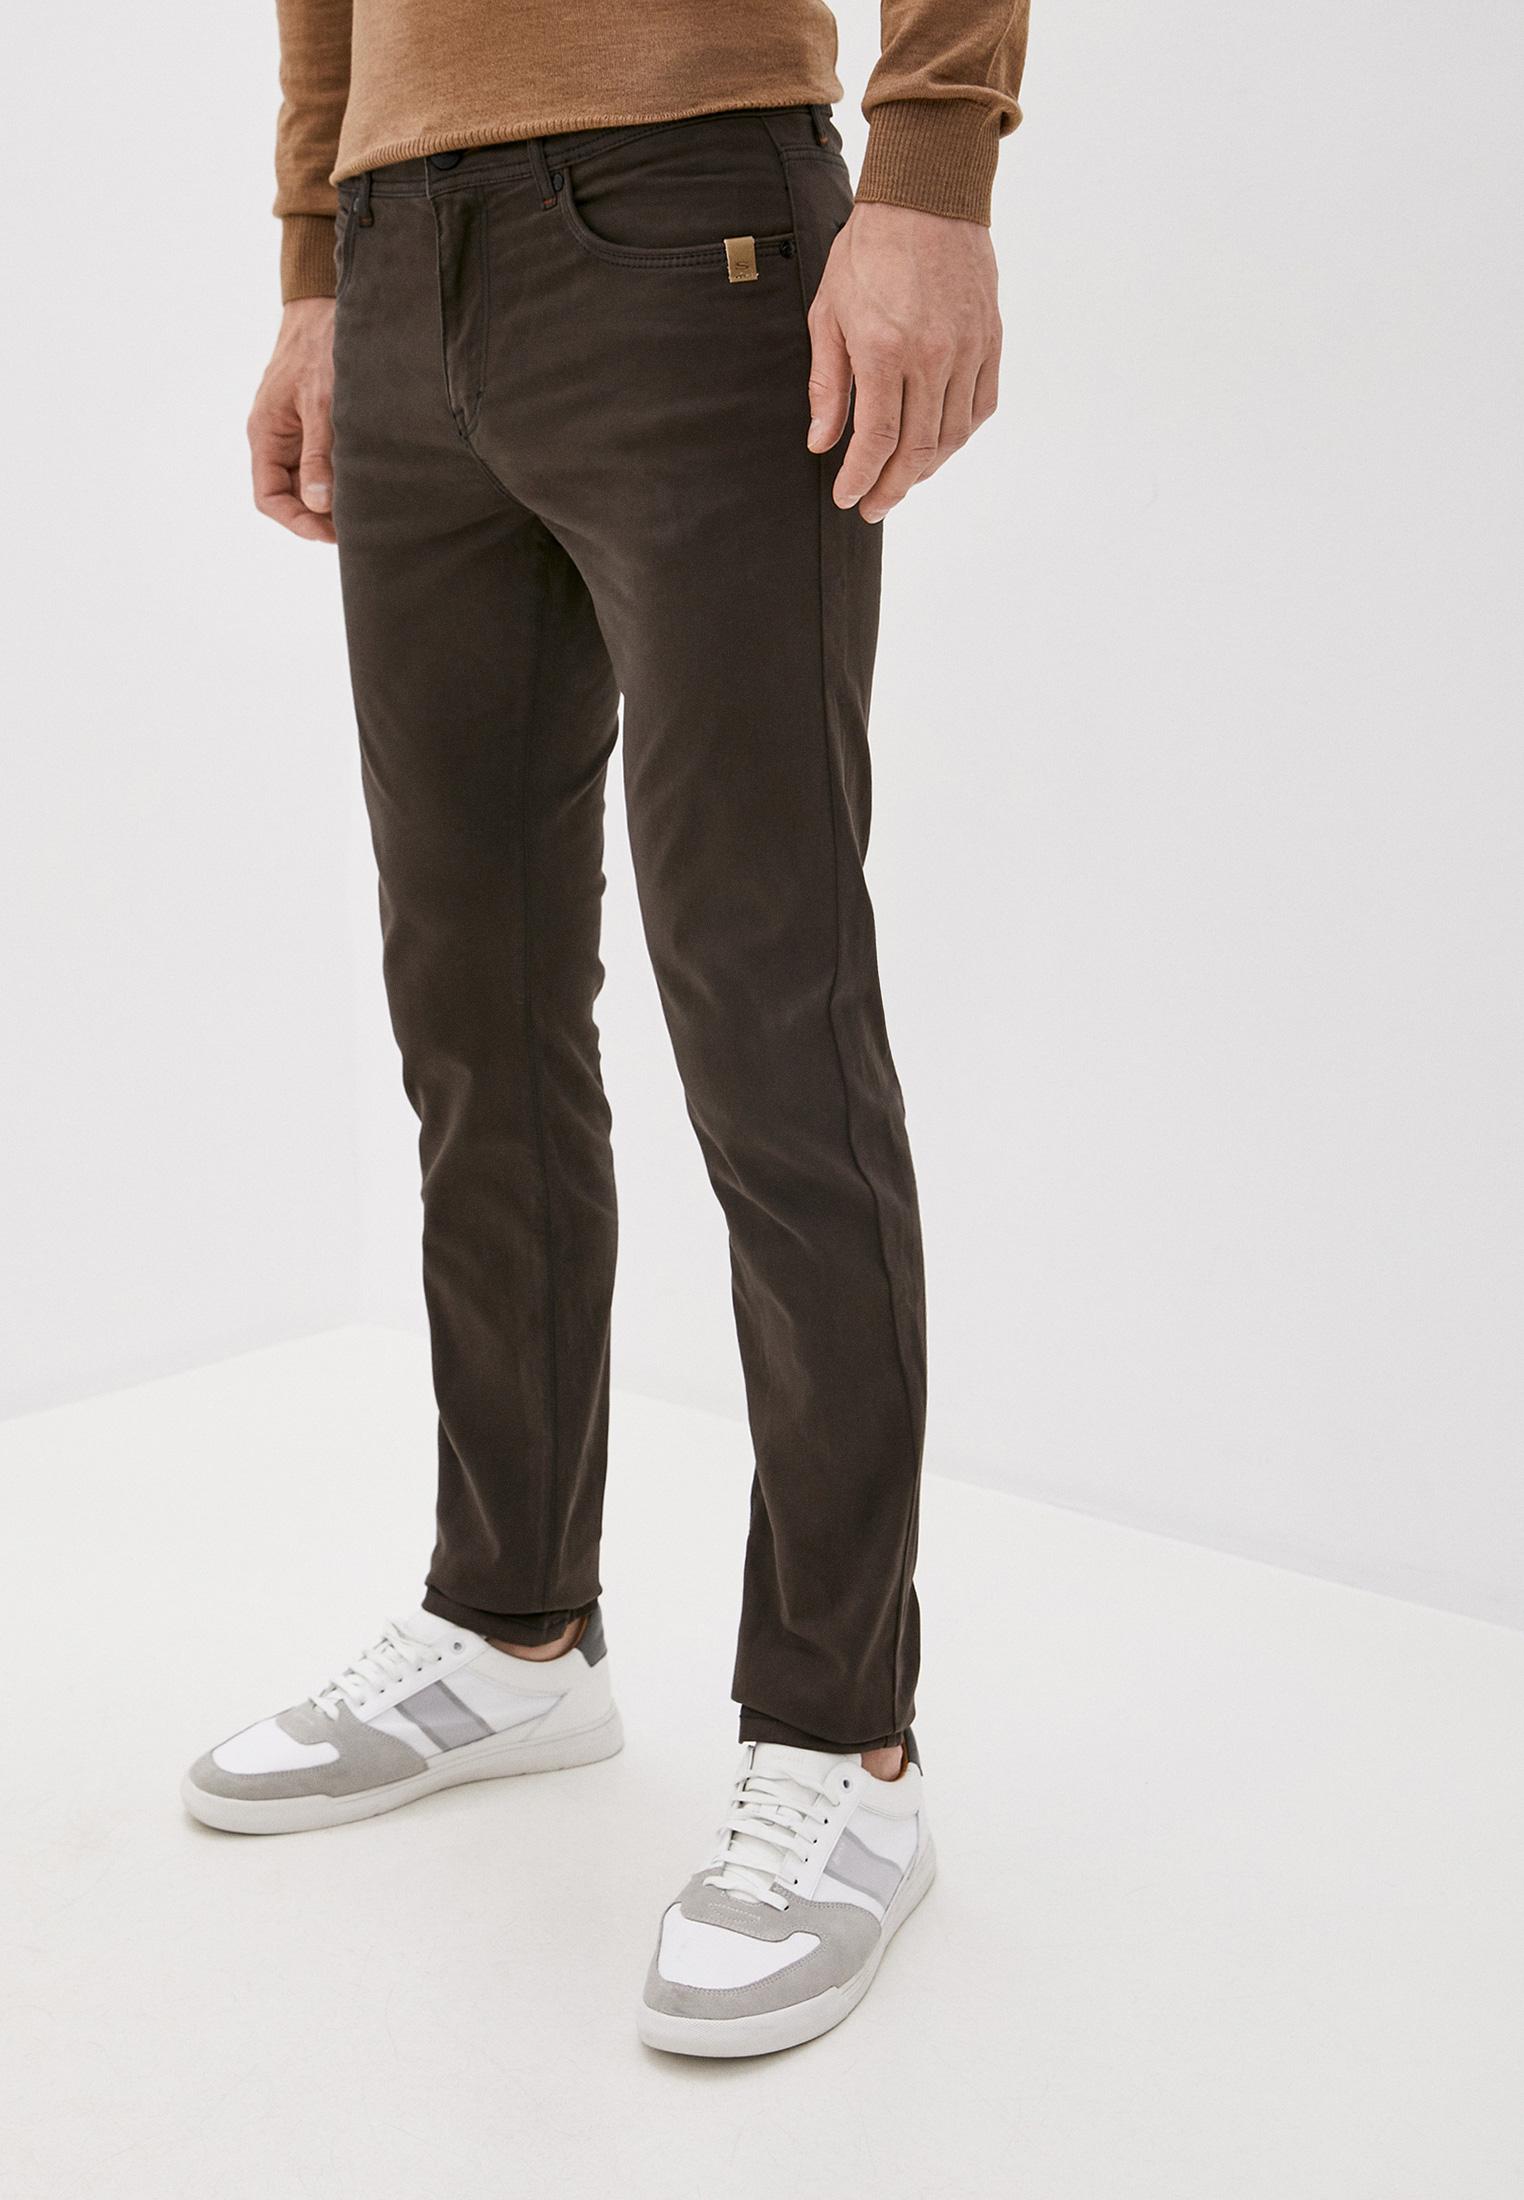 Мужские брюки Sand 031m27394